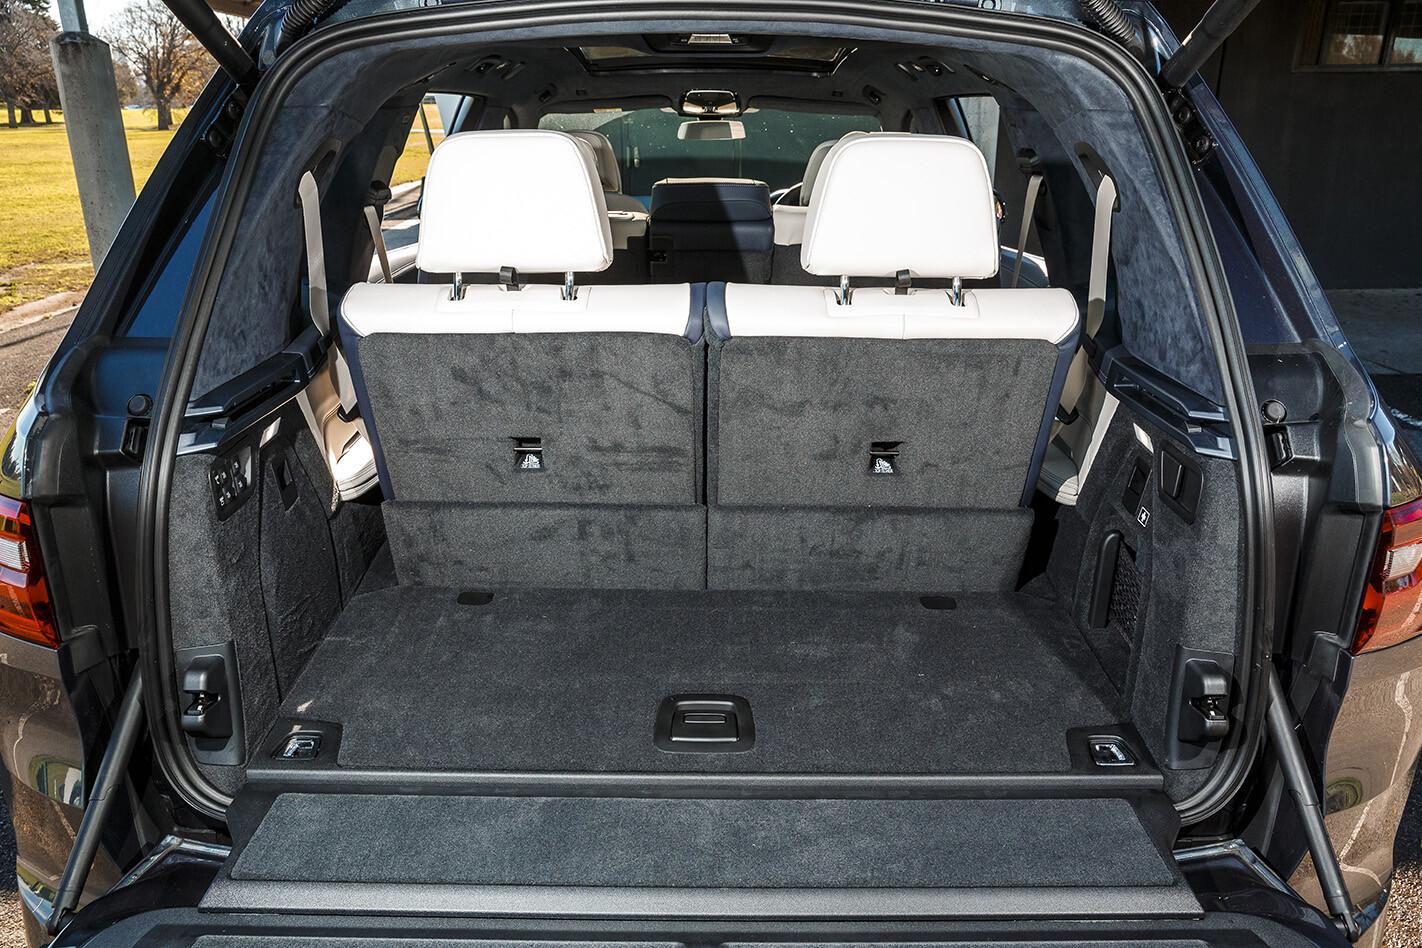 2019 Bmw X 7 30 D Review Interior Bootmin Jpg